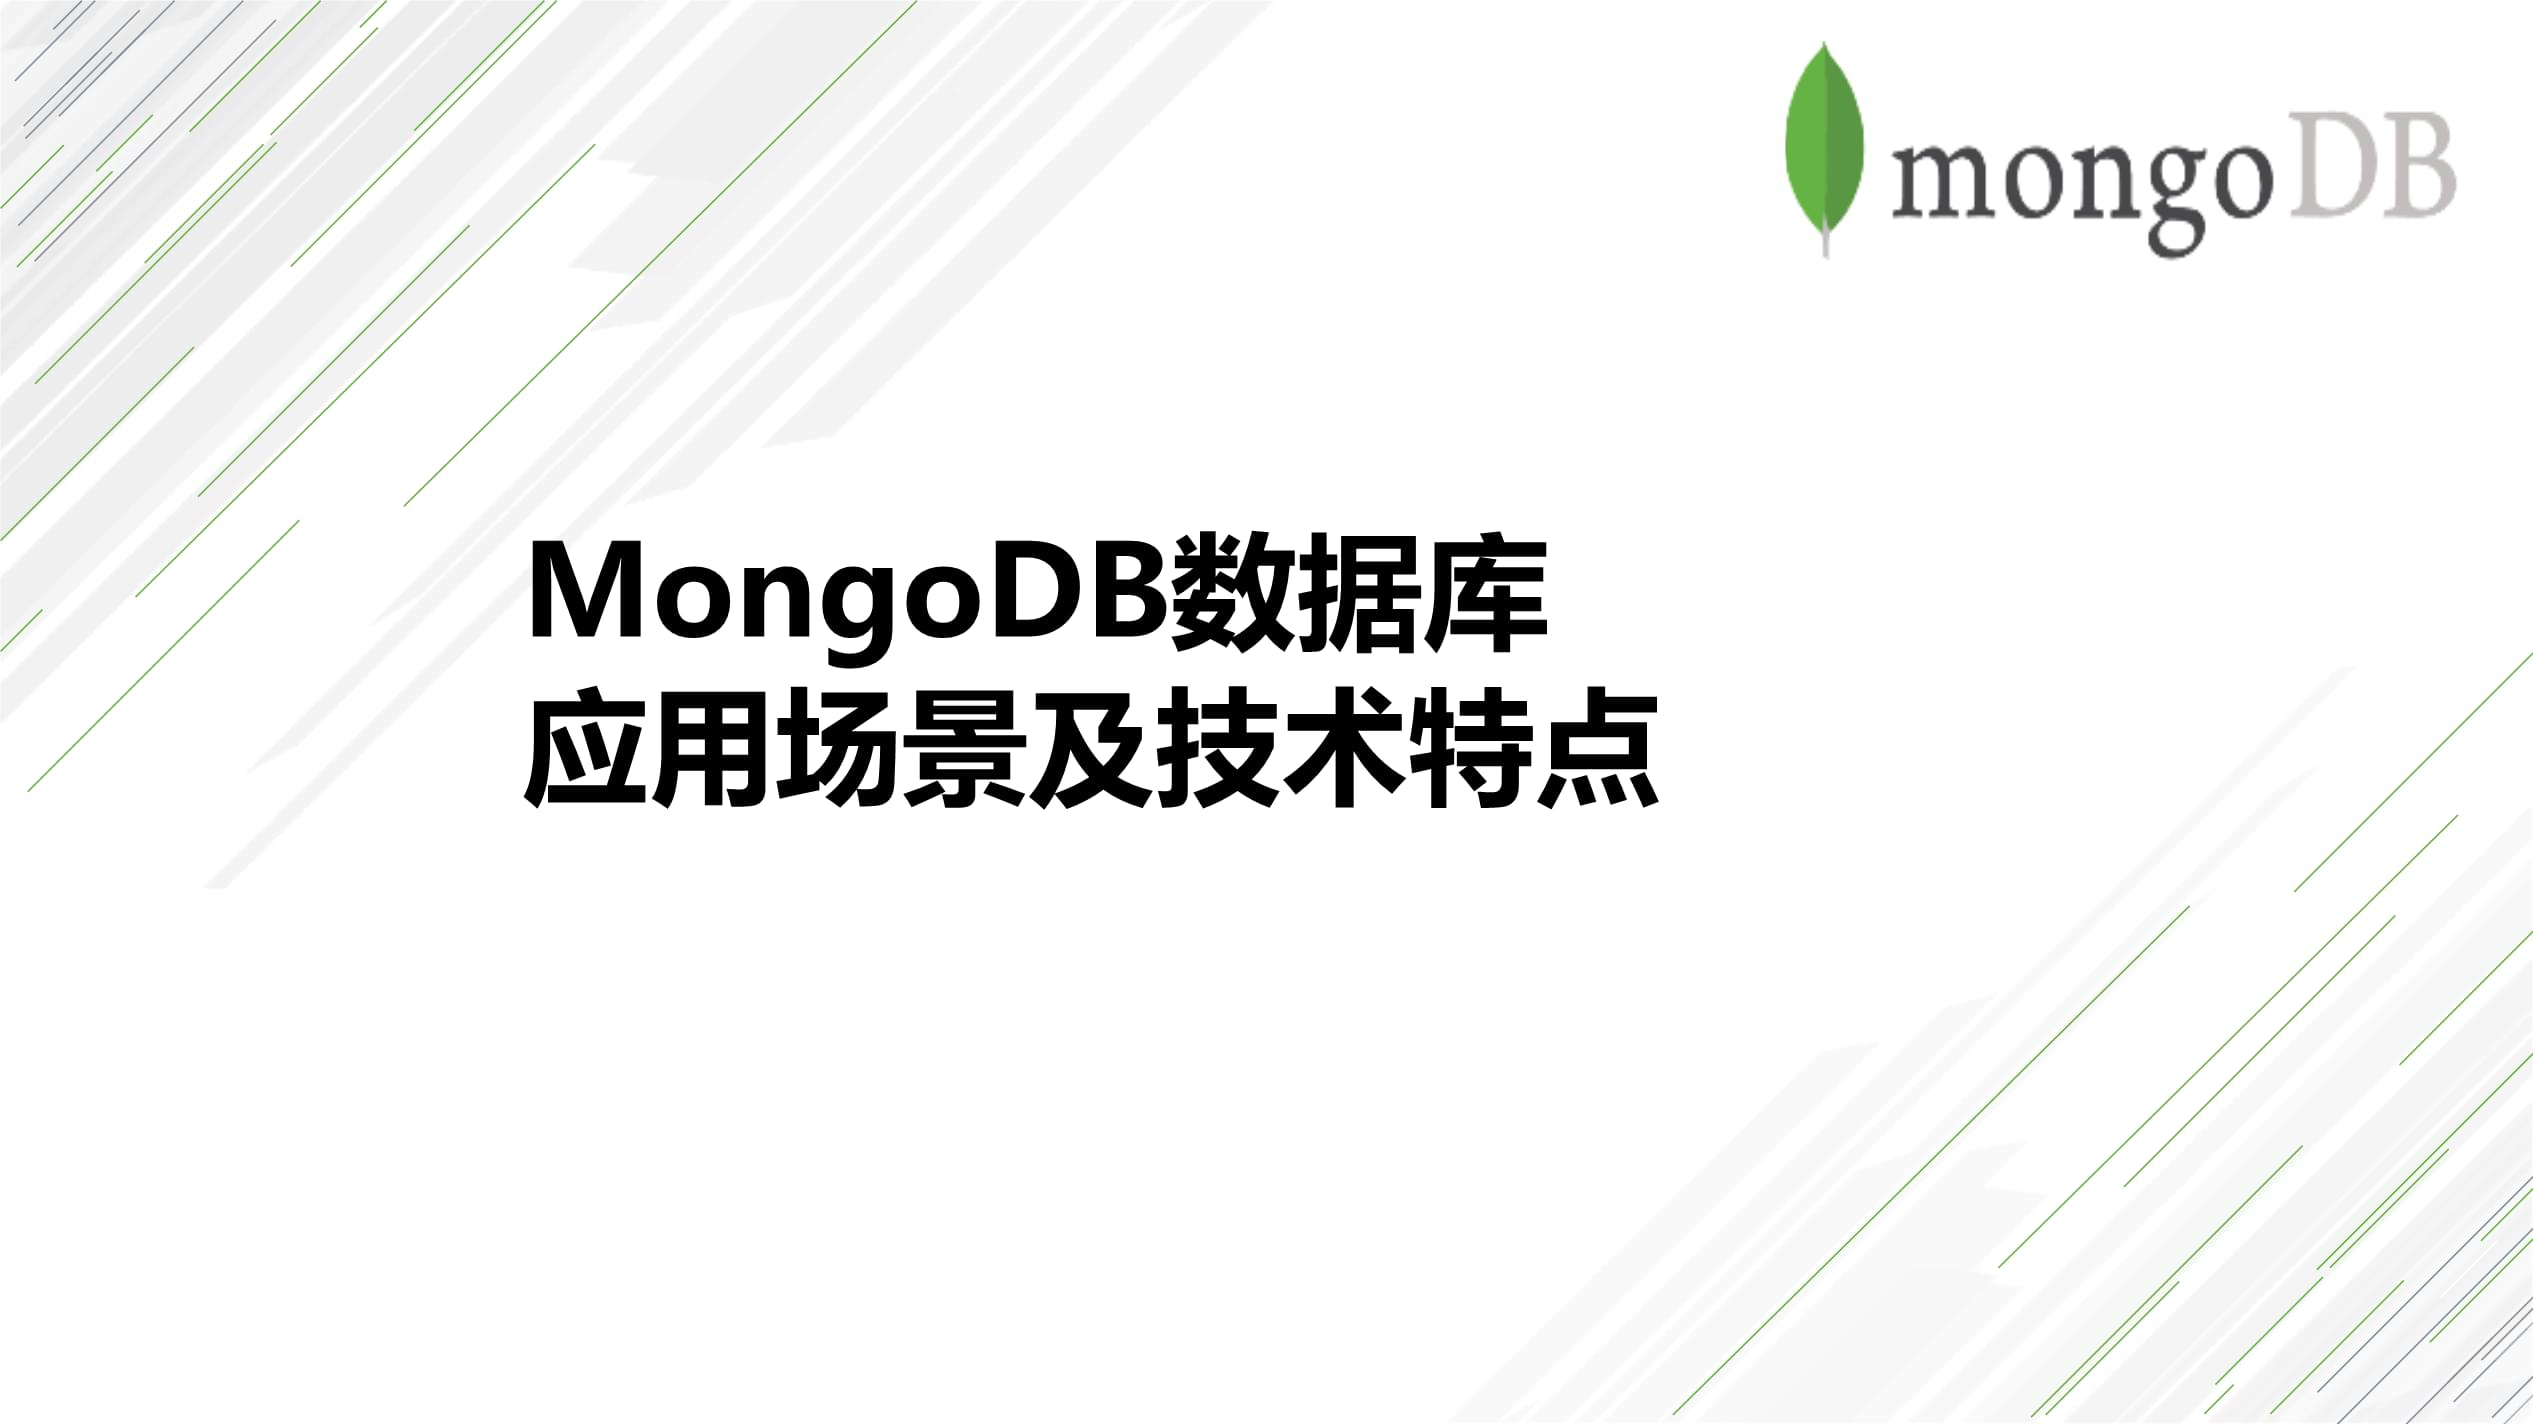 MongoDB数据库应用场景及技术特点.pptx